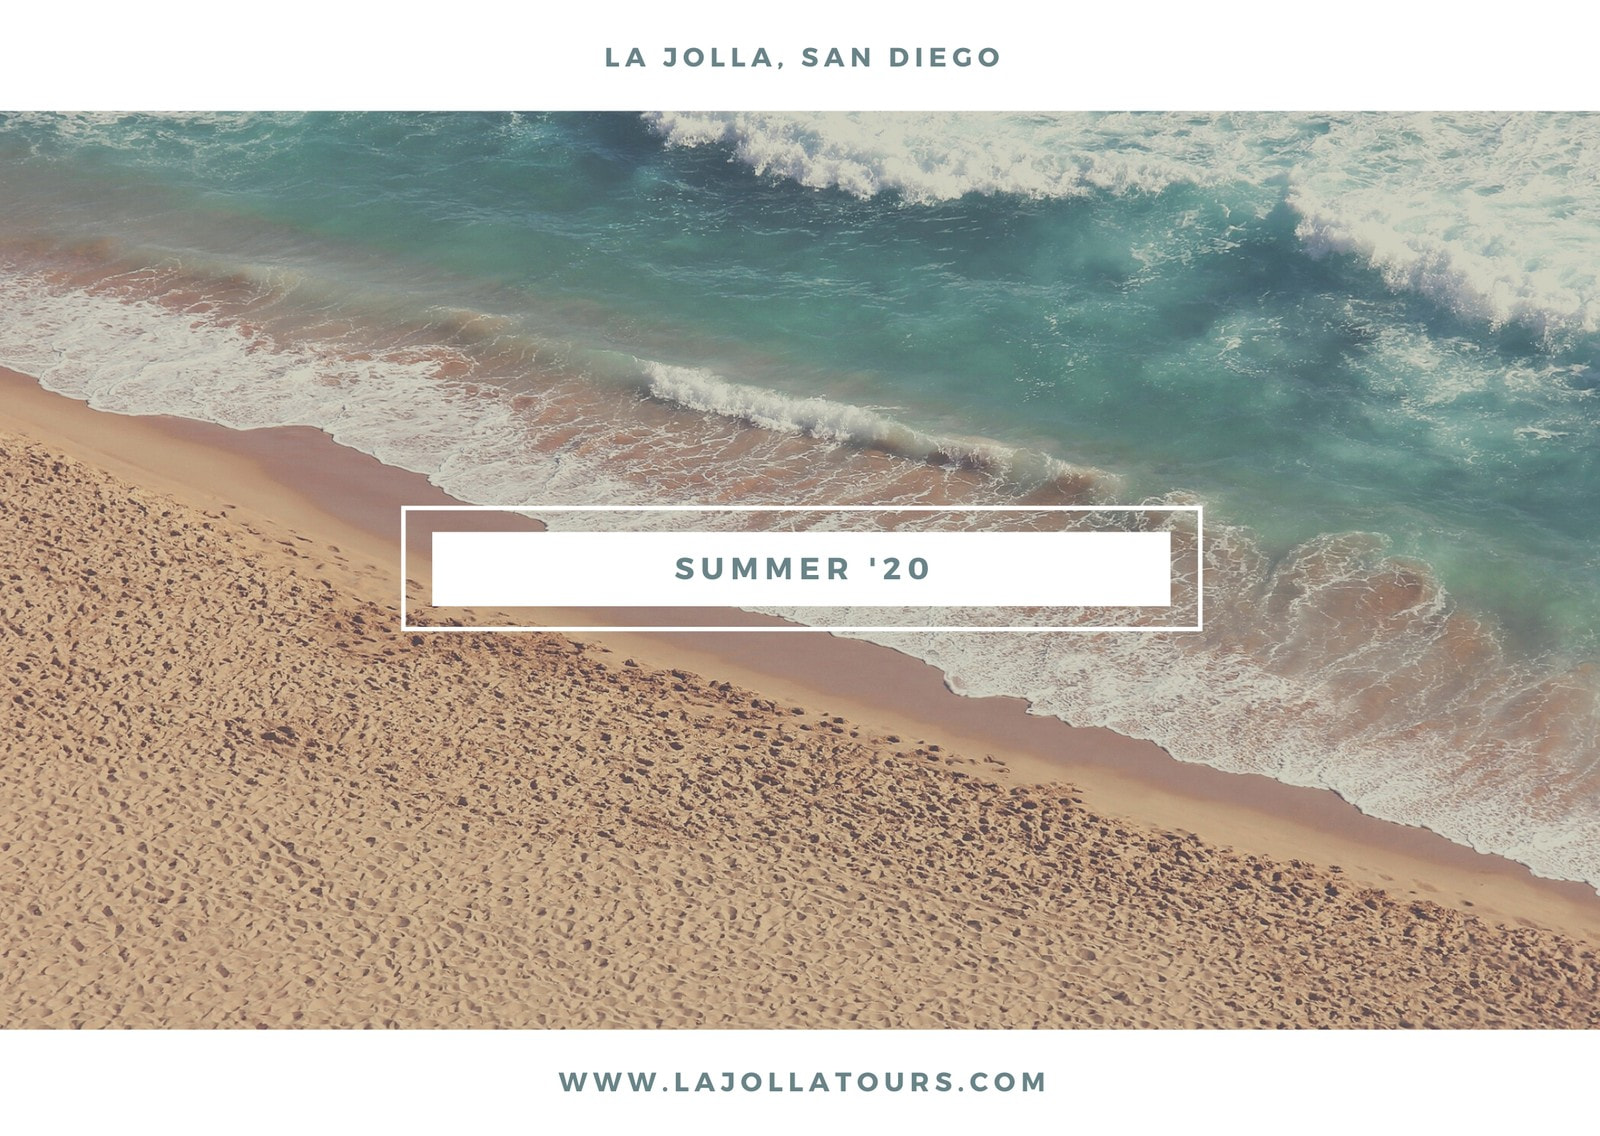 Beach Location Holiday Postcard